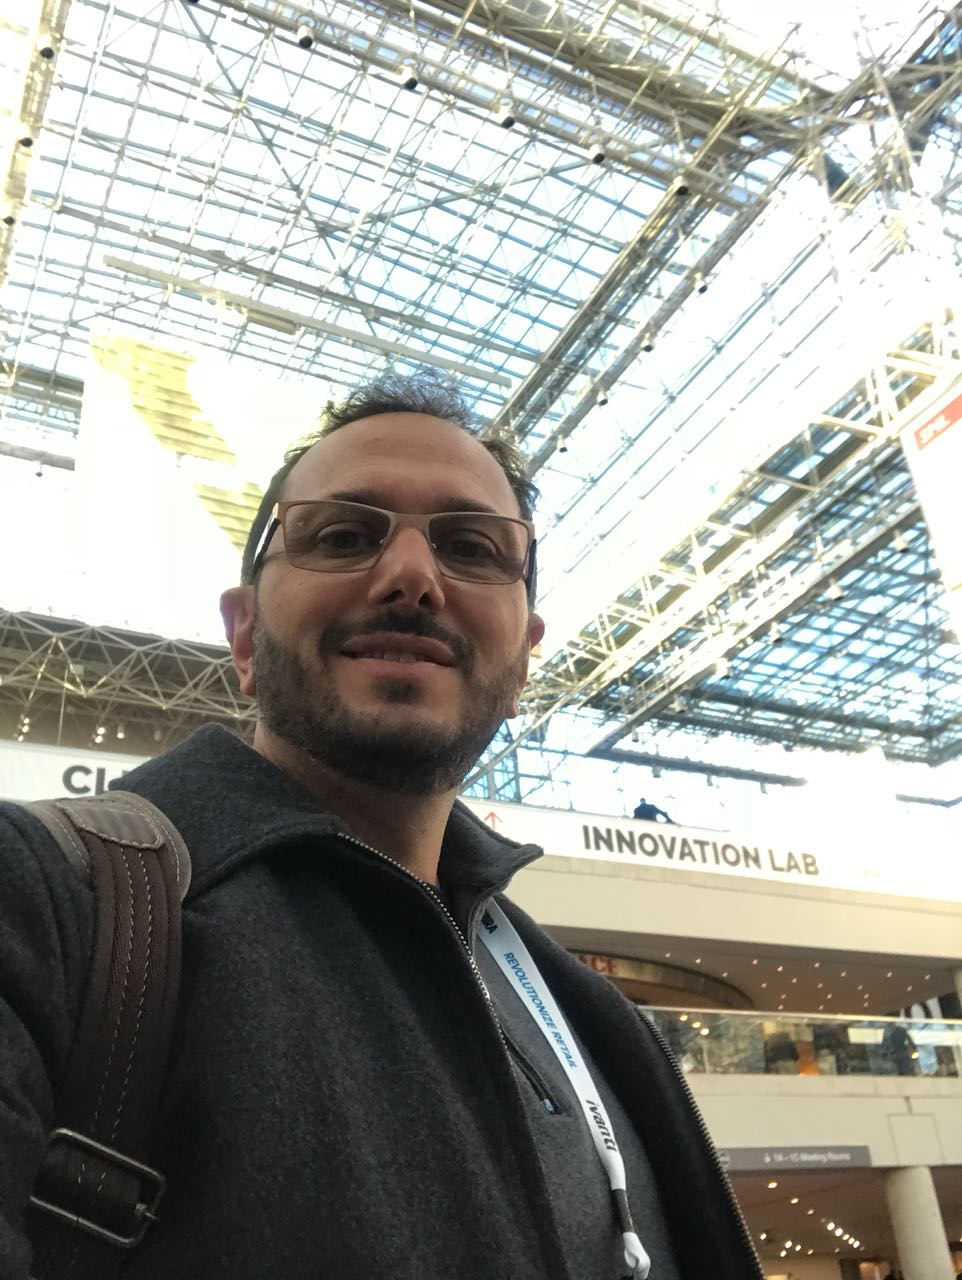 Giovani De Zorzi na NRF Retail's Big Show 2018